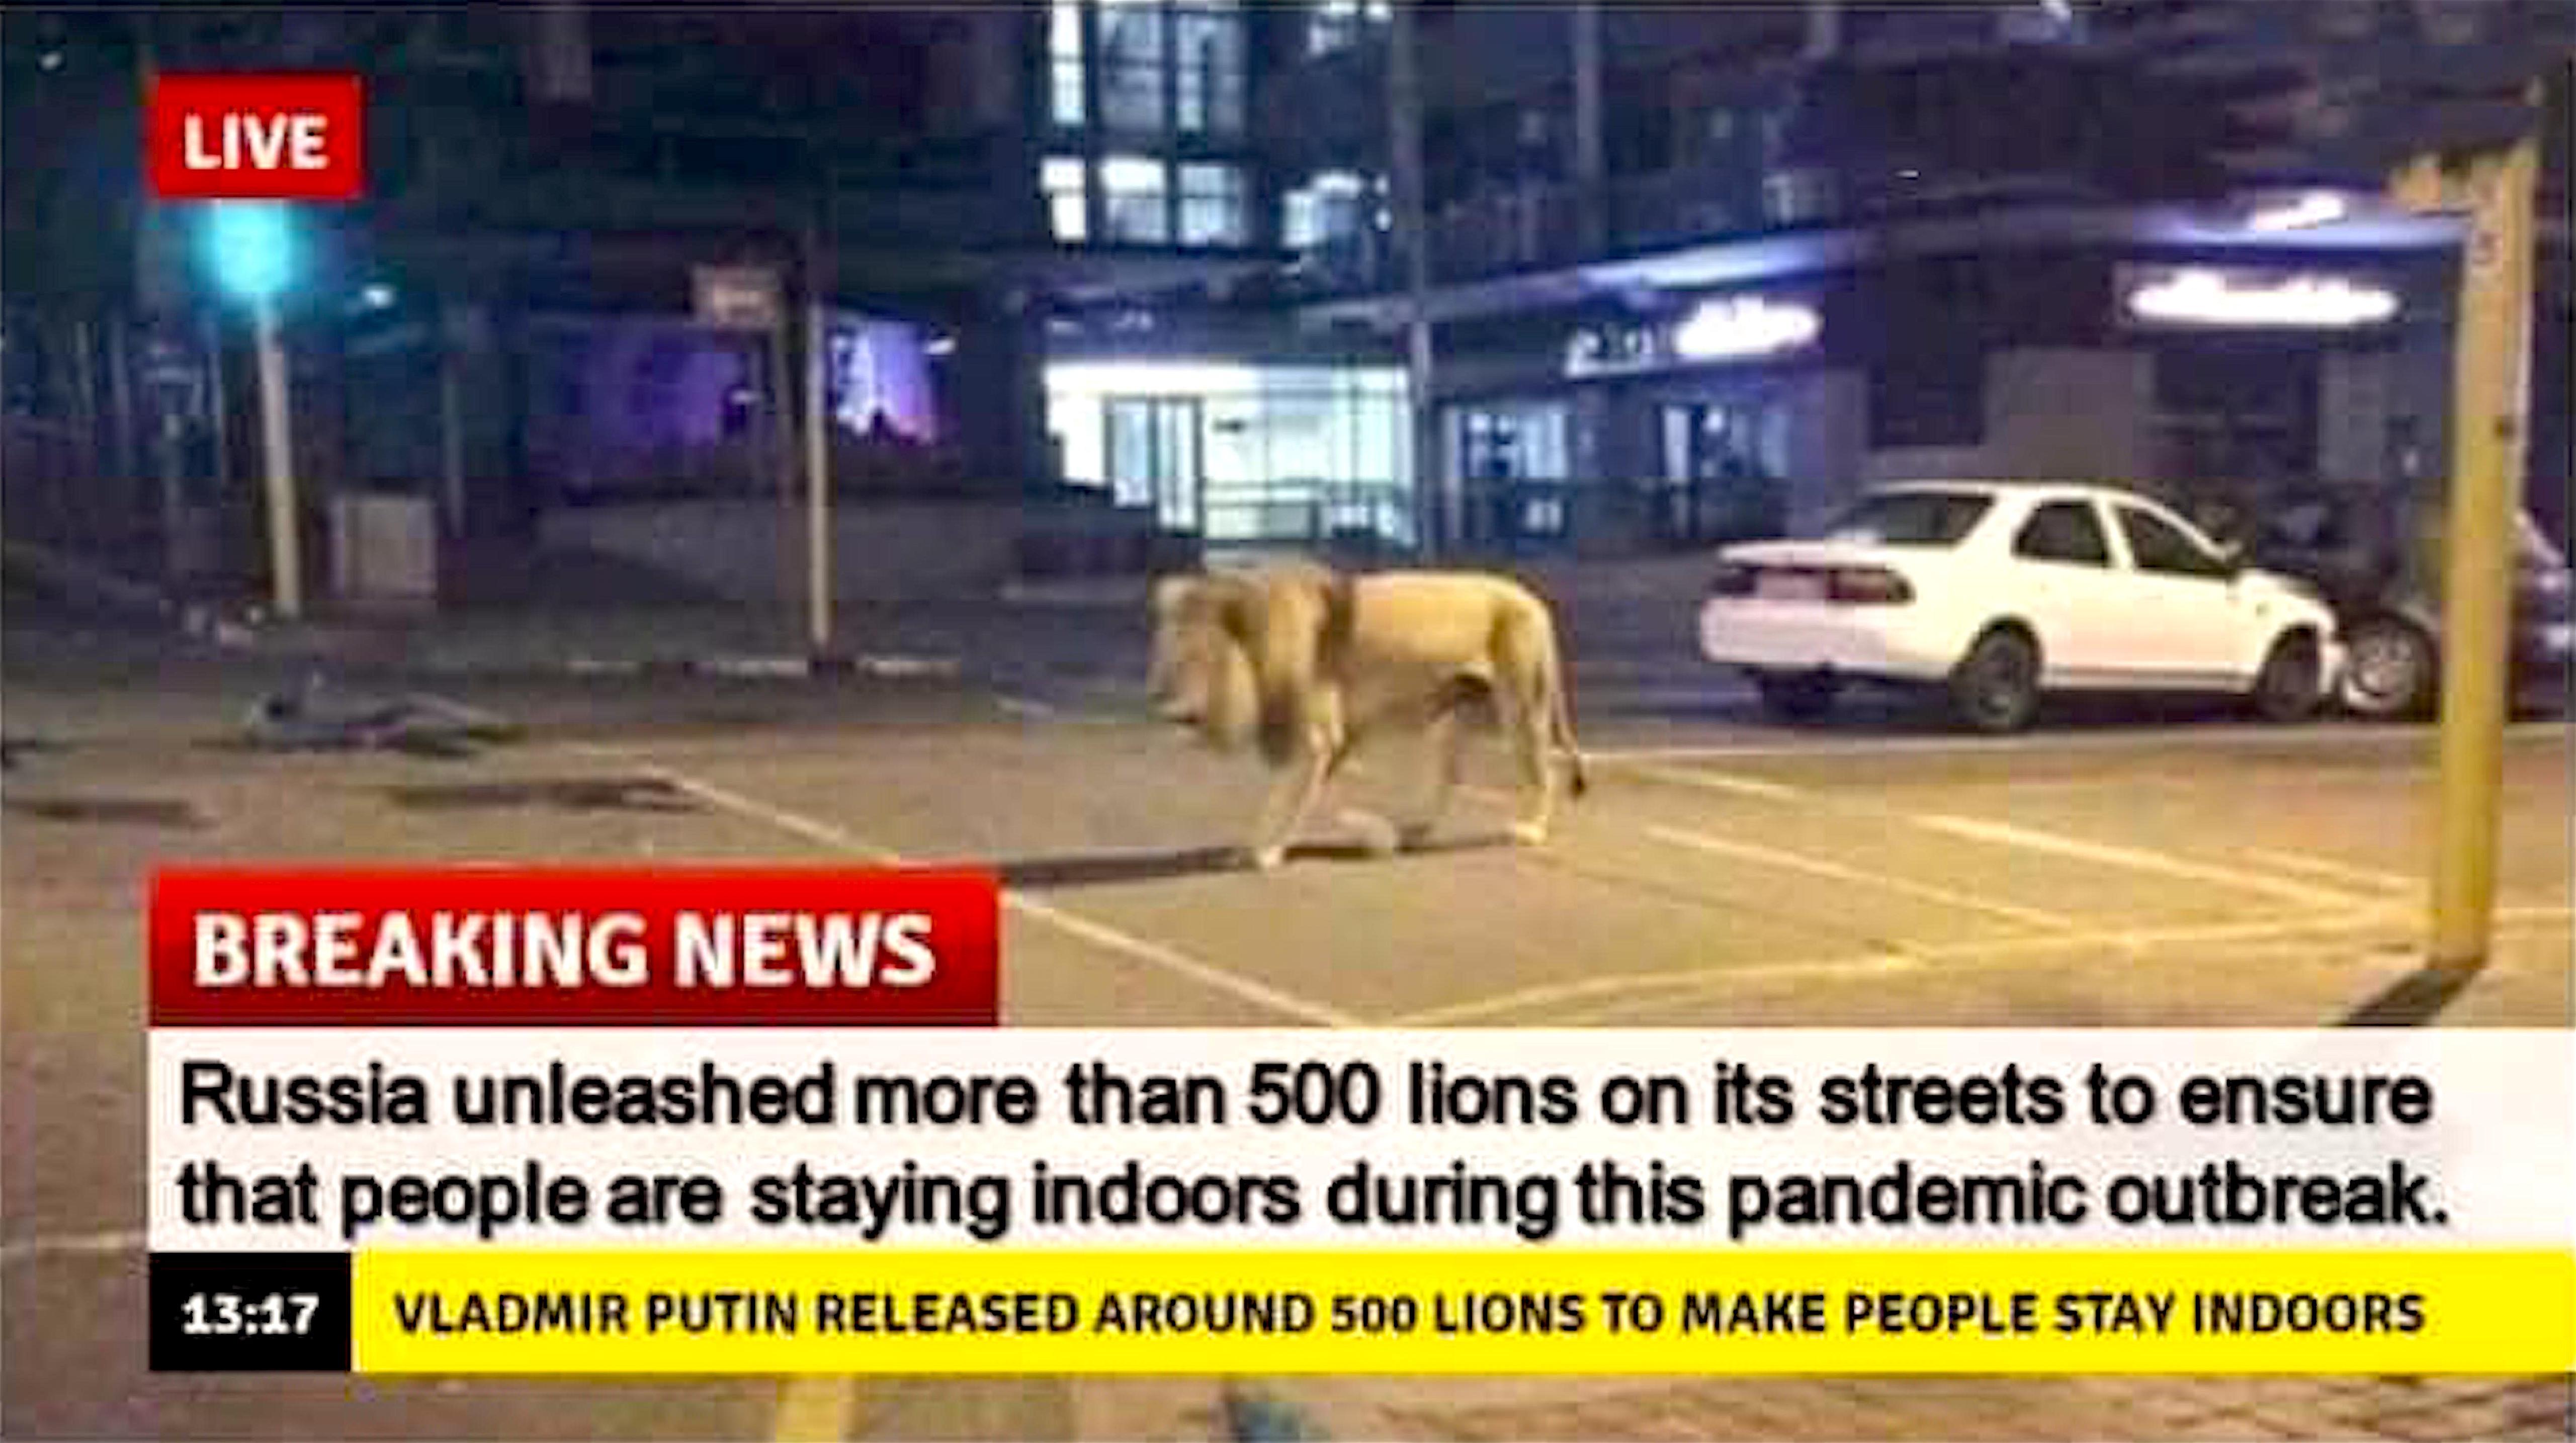 Vladimir Putin released around 500 lions to make people stay indoors (foto Twitter)